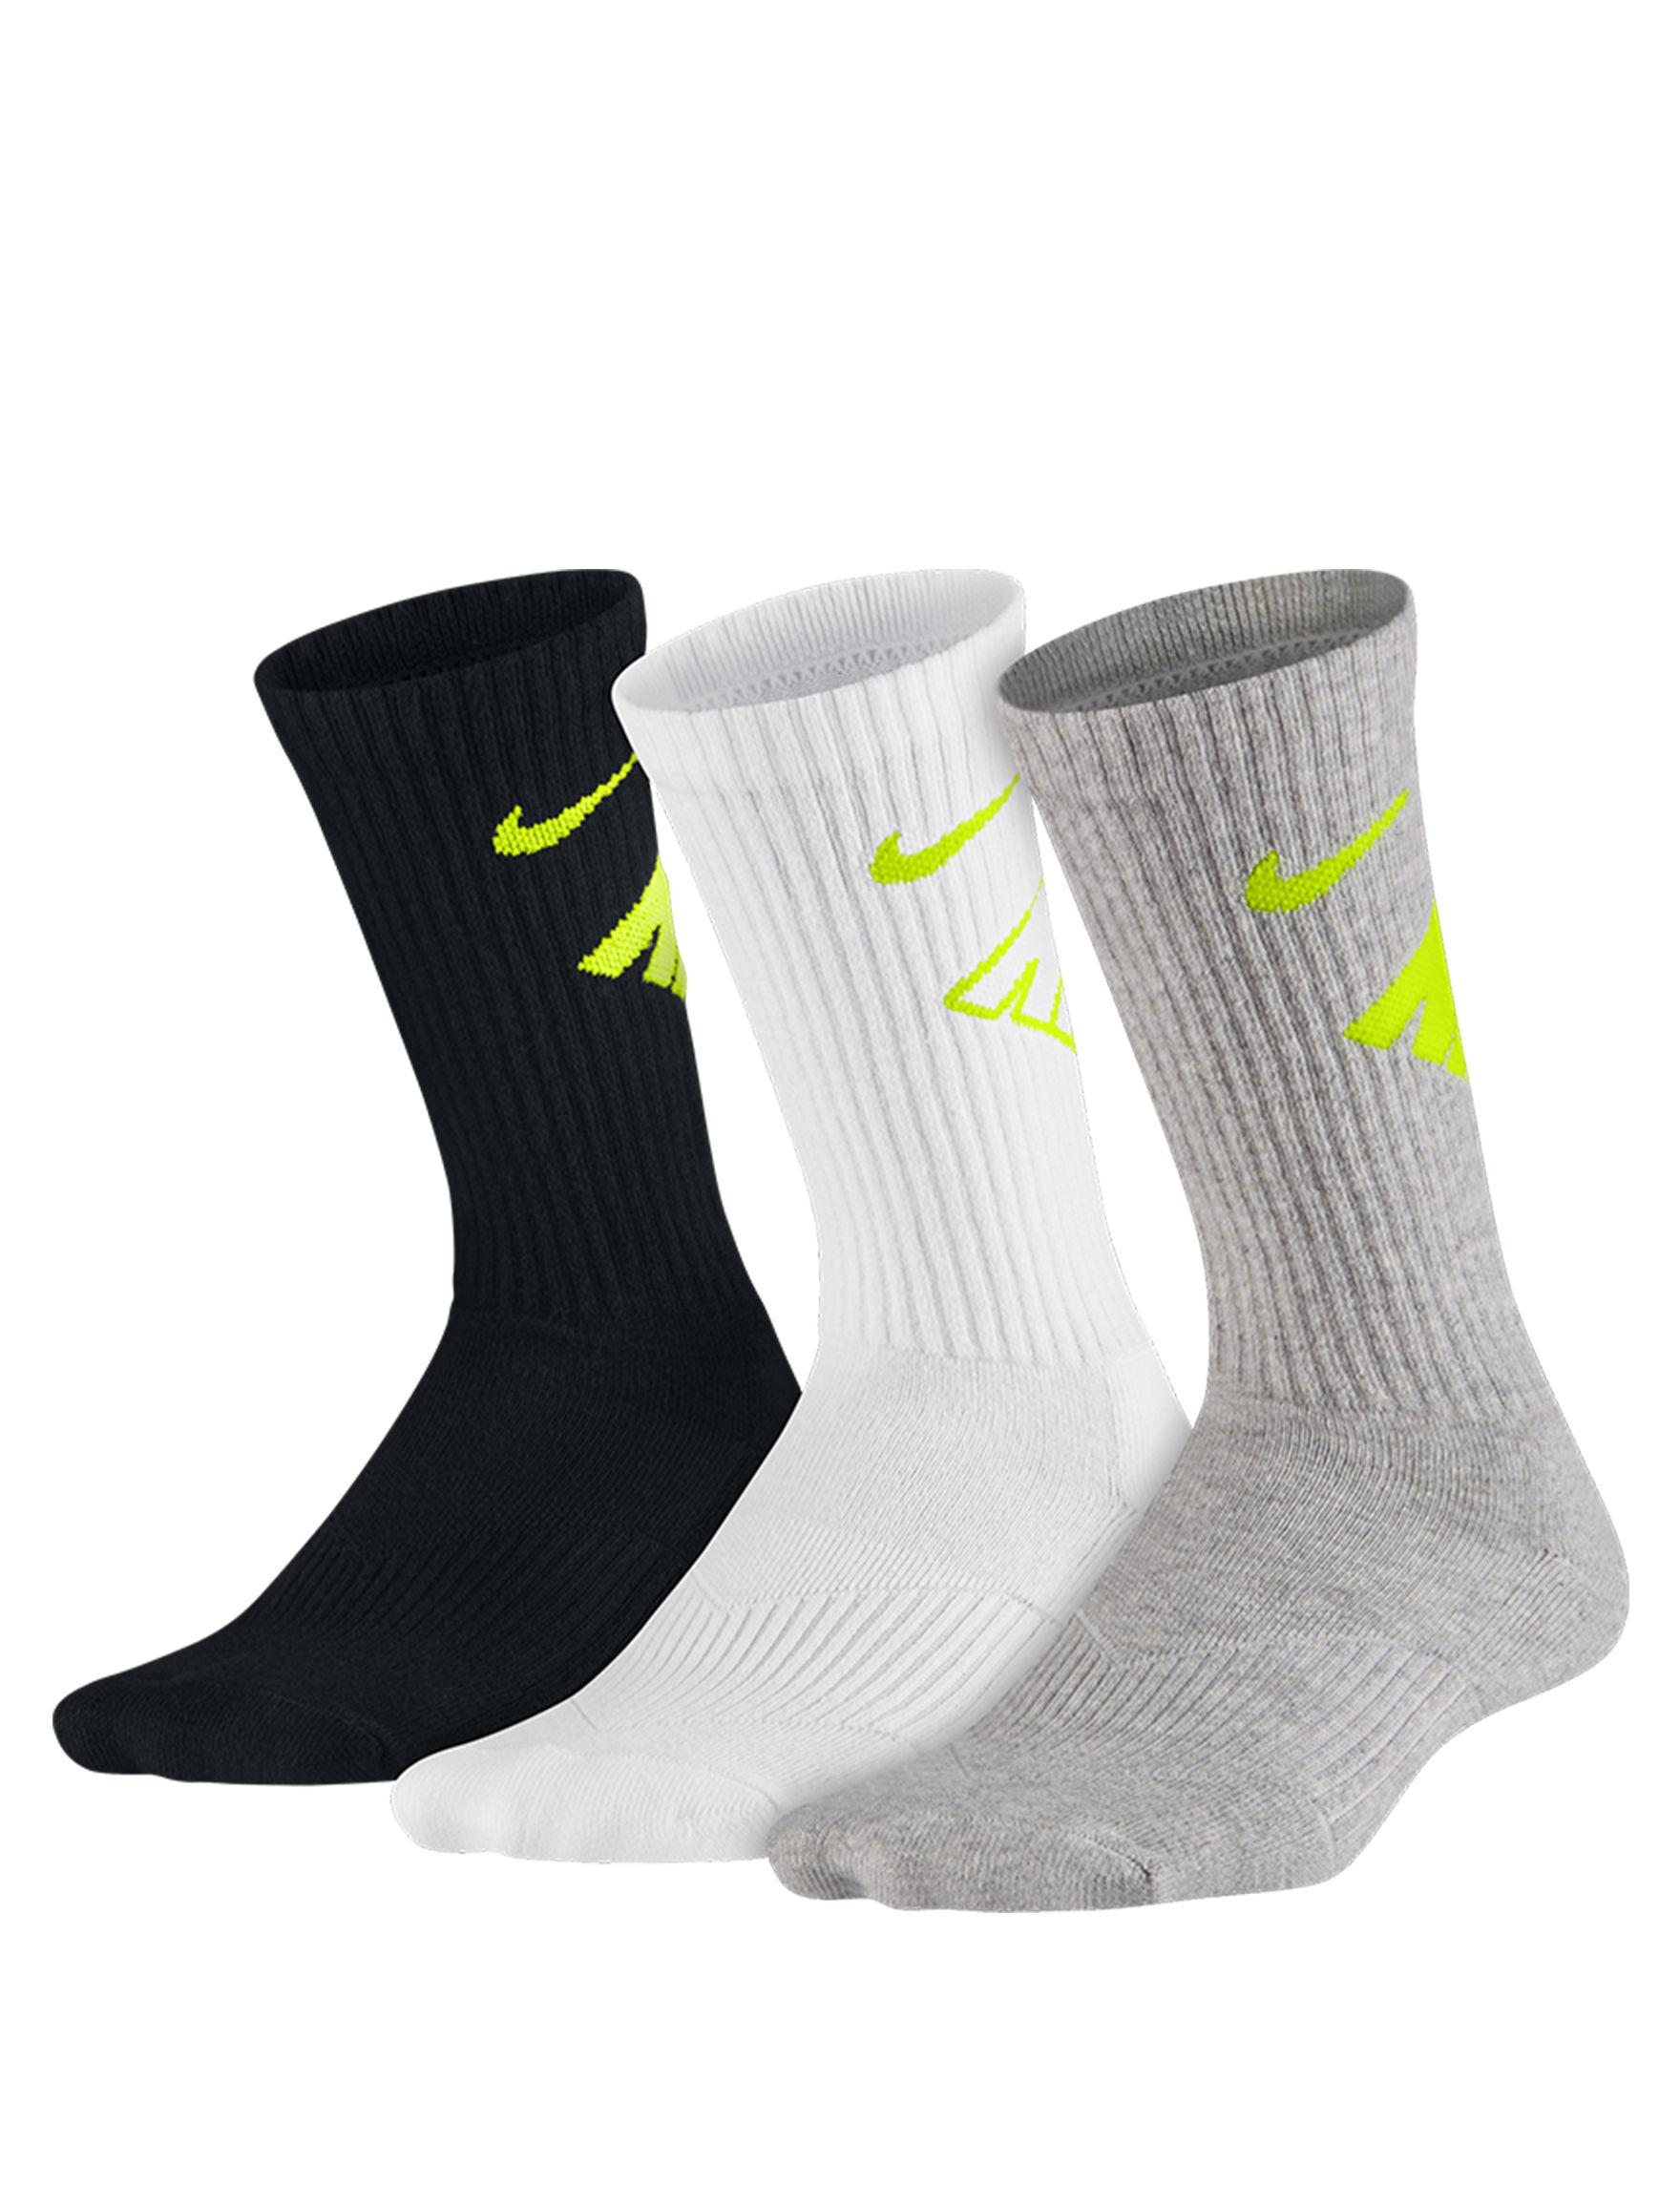 Nike Multi Socks